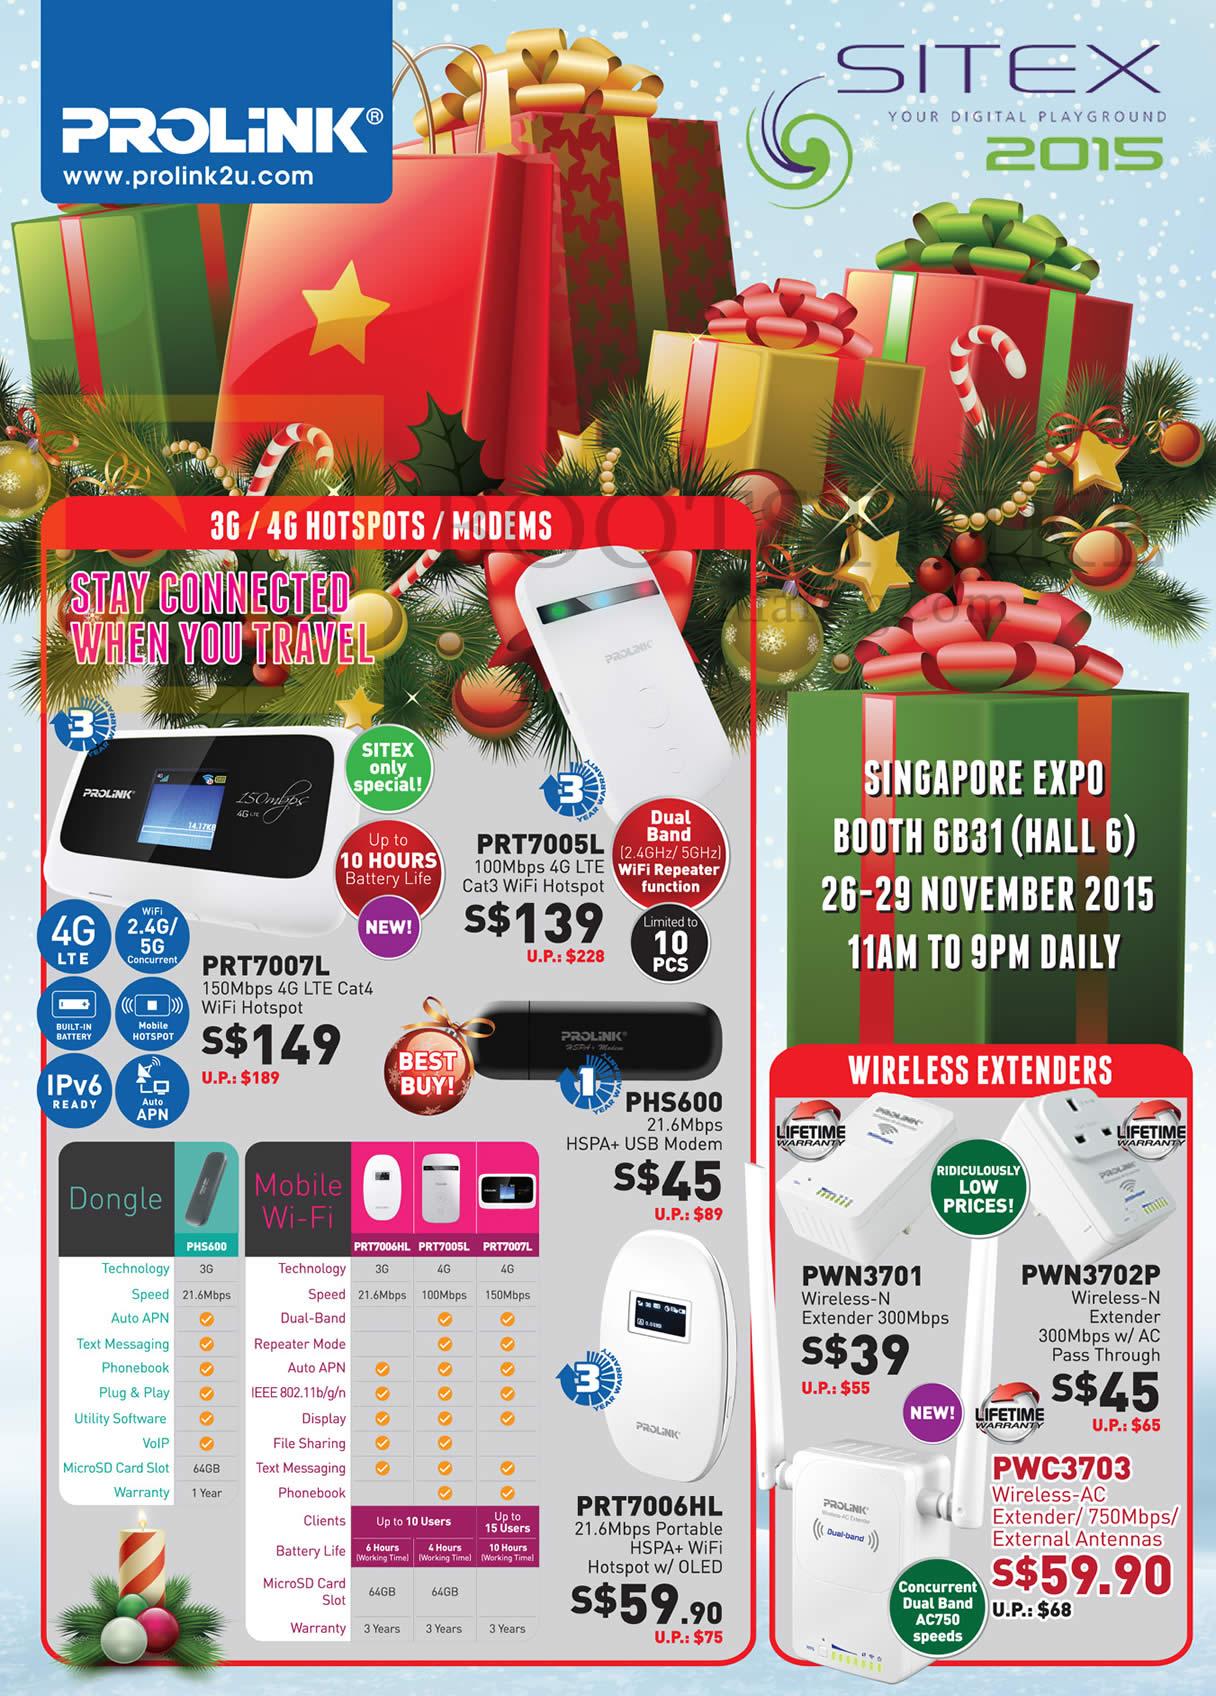 SITEX 2015 price list image brochure of Prolink 3G, 4G Hotspots, Modems, Wireless Extenders, PRT7007L, 7005L, 7006HL, PHS600, PWN3701, 3702P, 3703